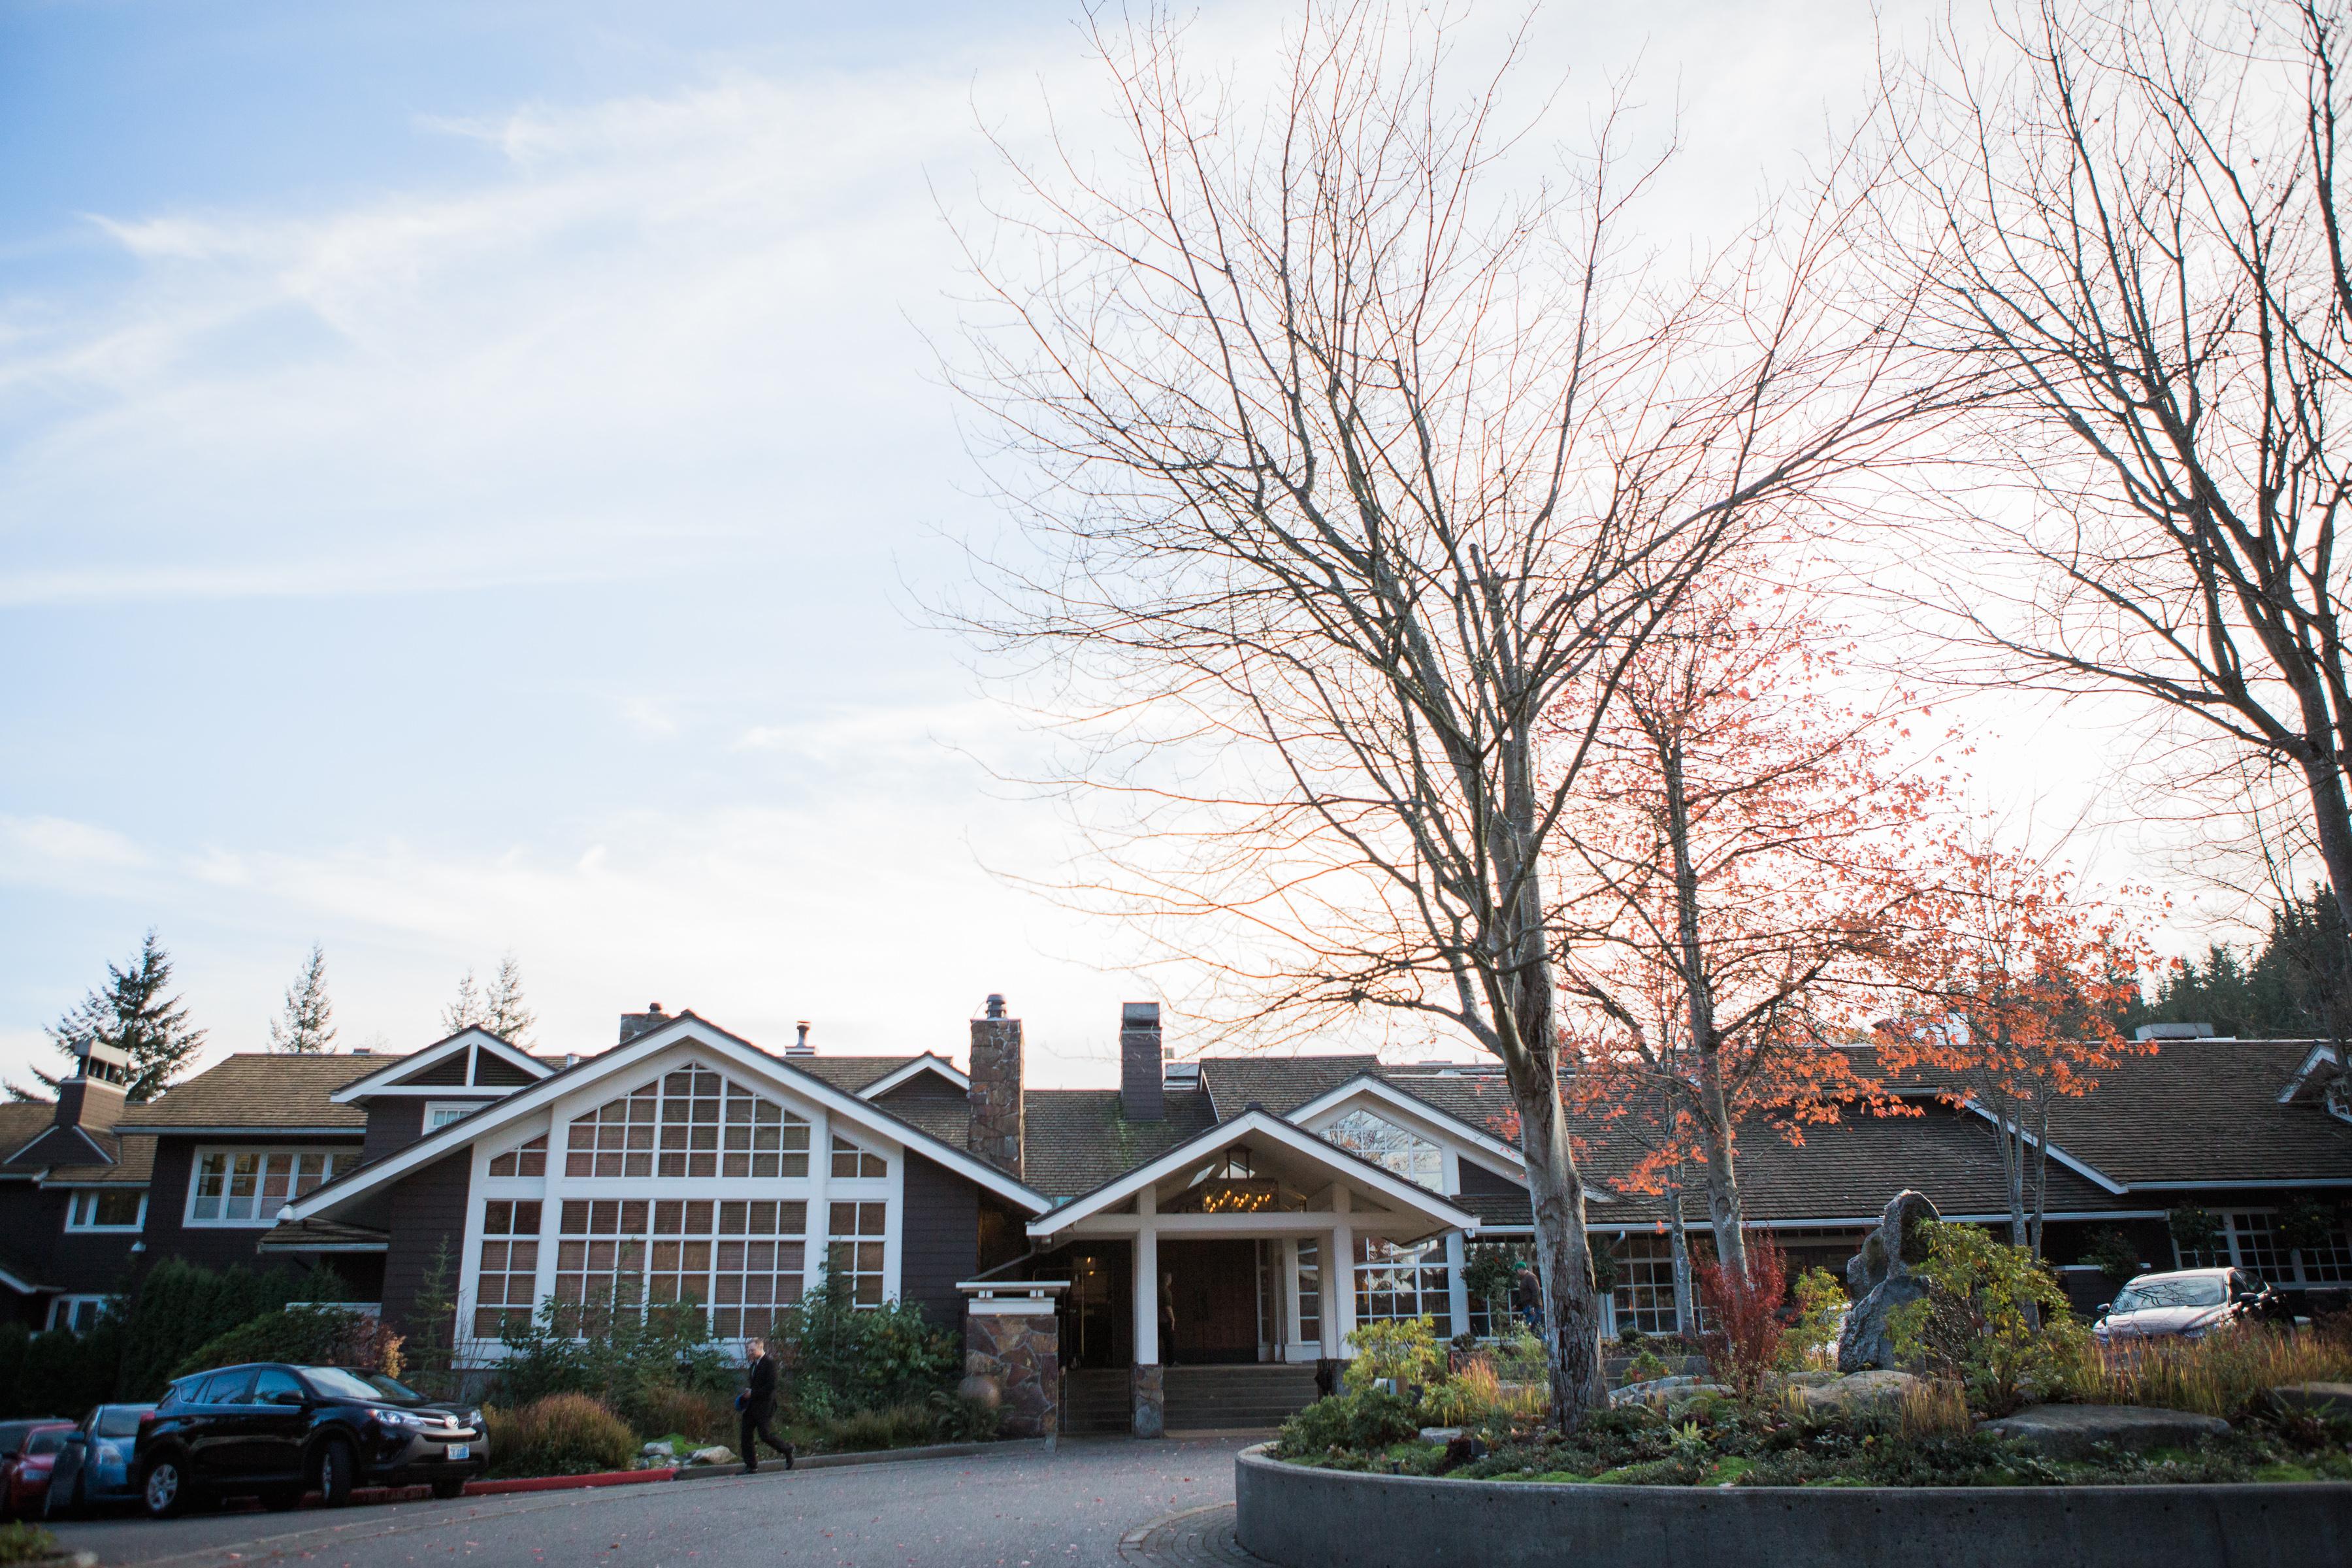 Salish Lodge Wedding in Seattle | PNW wedding at Salish Lodge | Perfectly Posh Events | Amy Galbraith Photography | Salish Lodge & Spa